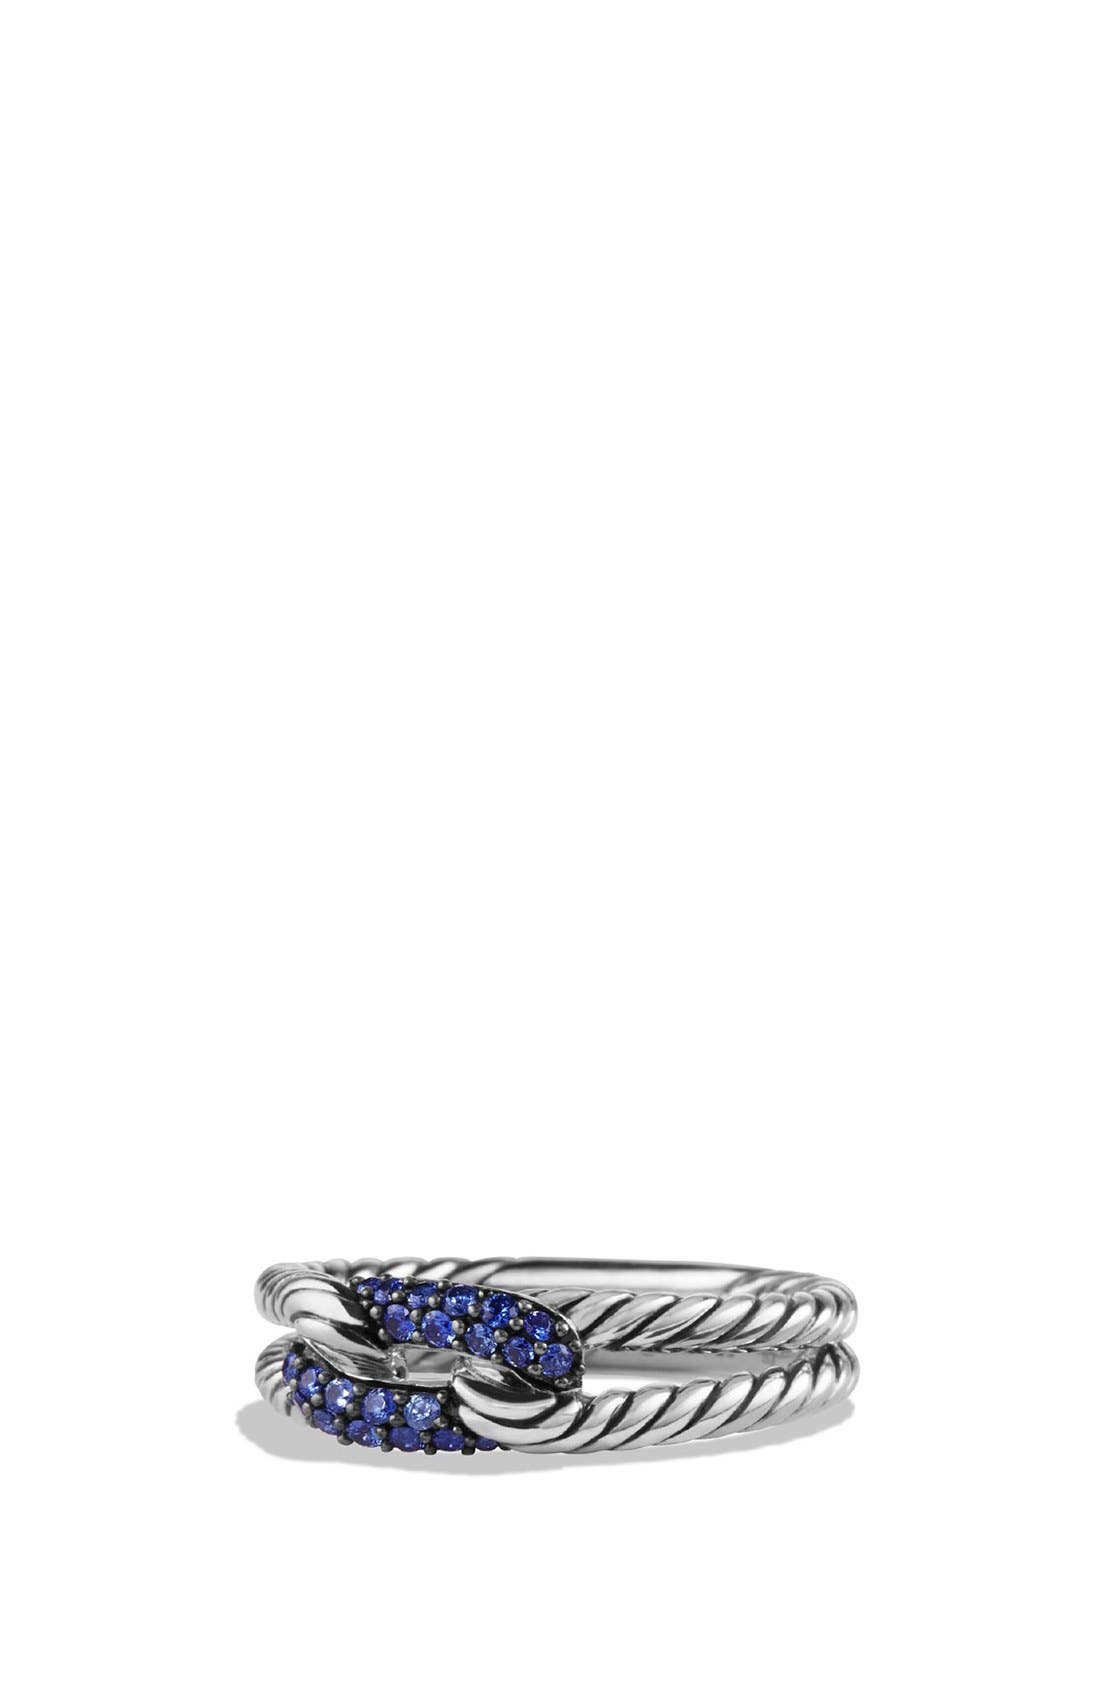 David Yurman 'Petite Pavé' Loop Ring with Sapphires